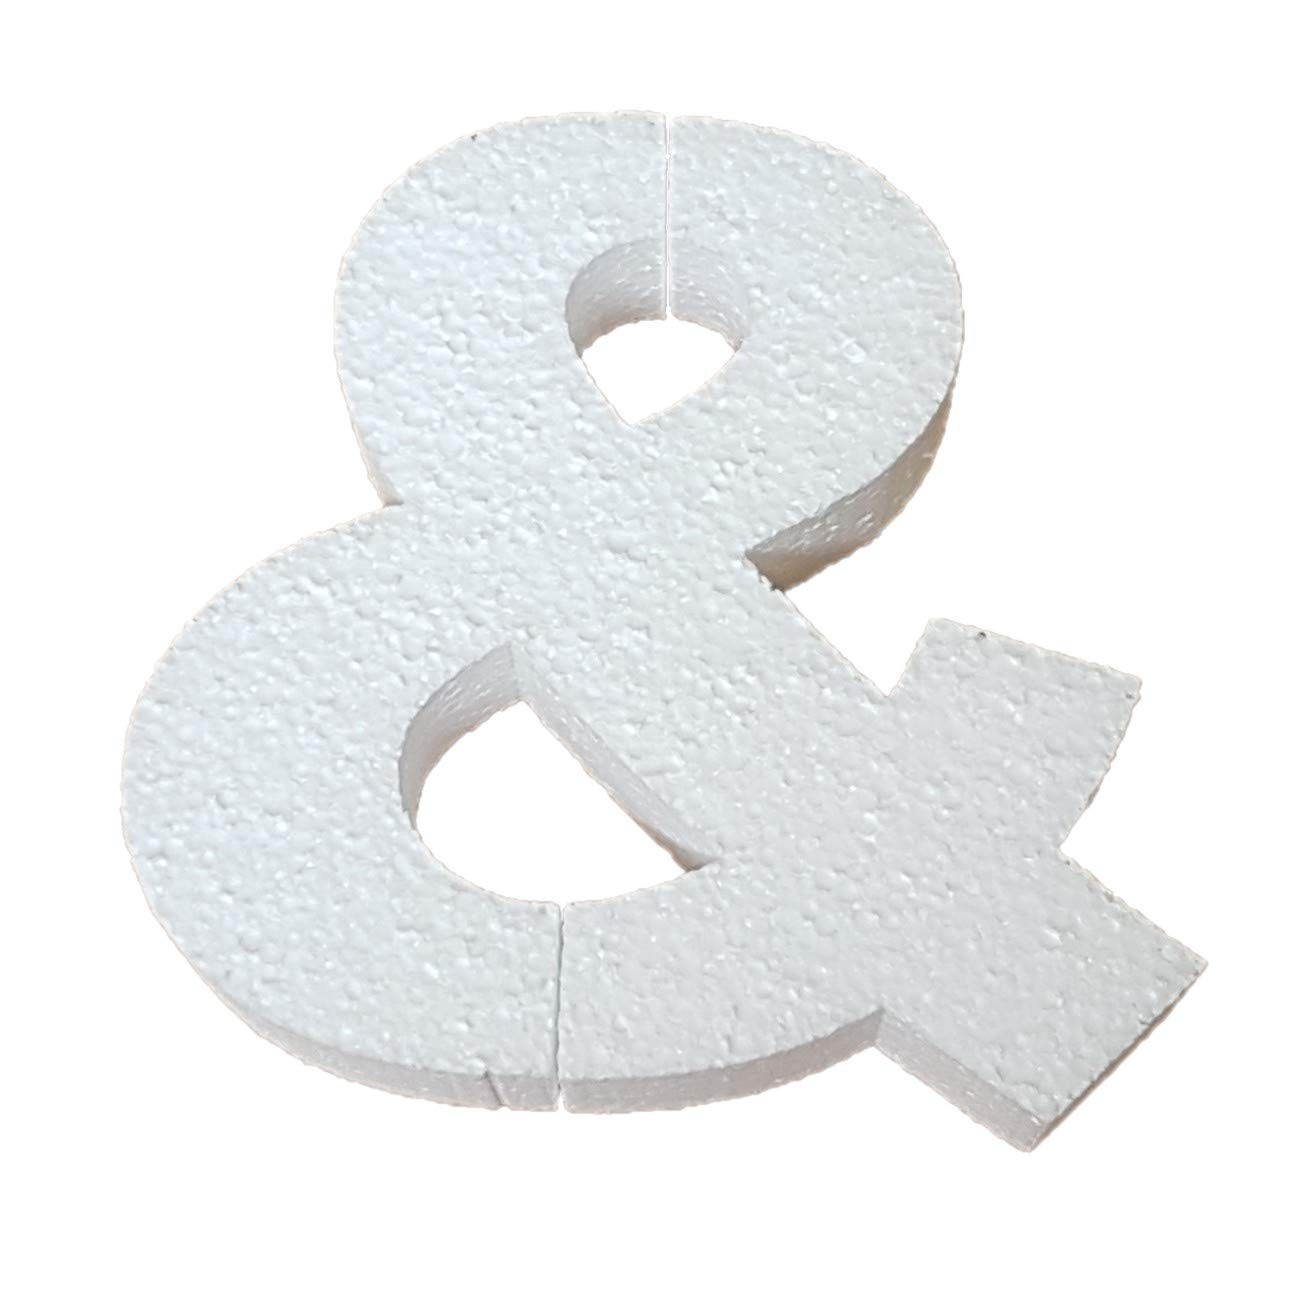 blanco Paneles de Poliestireno Poliestireno expandido sinterizado de 3 cm de espesor  para aislamiento t/érmico de vigas EPS 100 Blanco pilares  o sistema de recubrimiento.